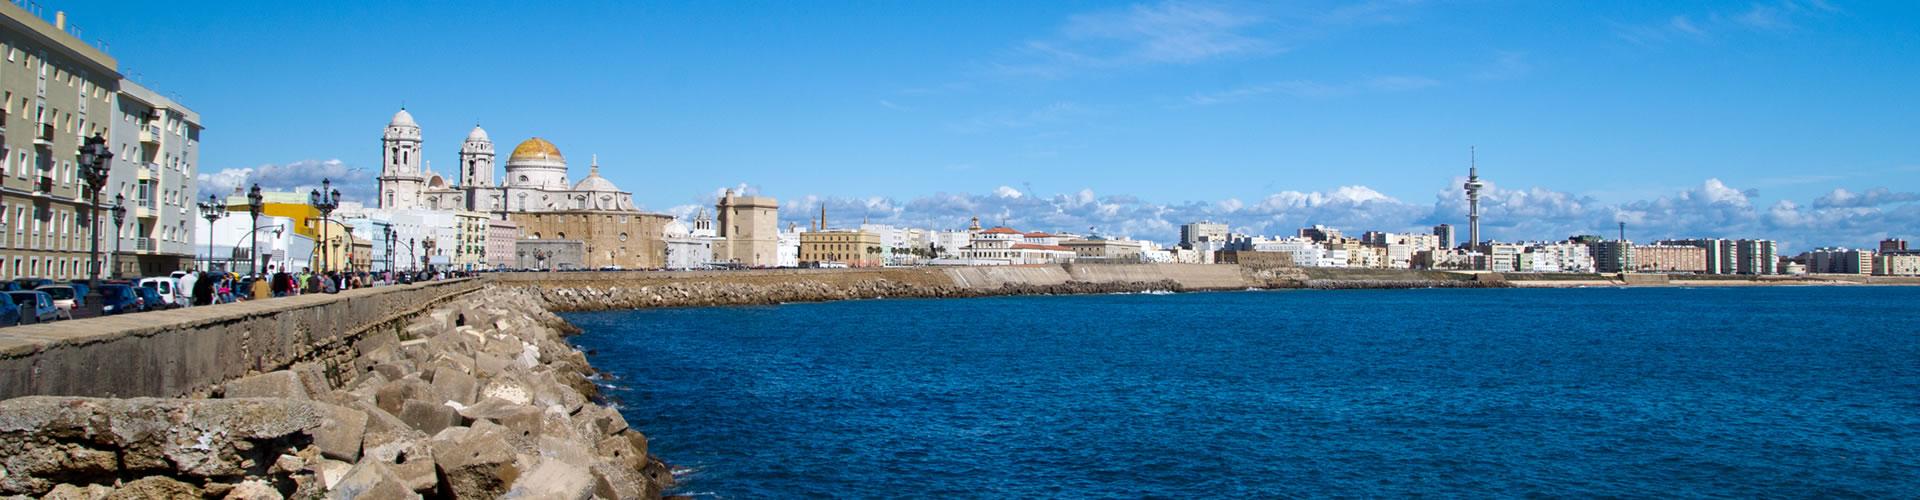 Hotel in Algeciras close to the port of Algeciras. Hotel Reina Cristina